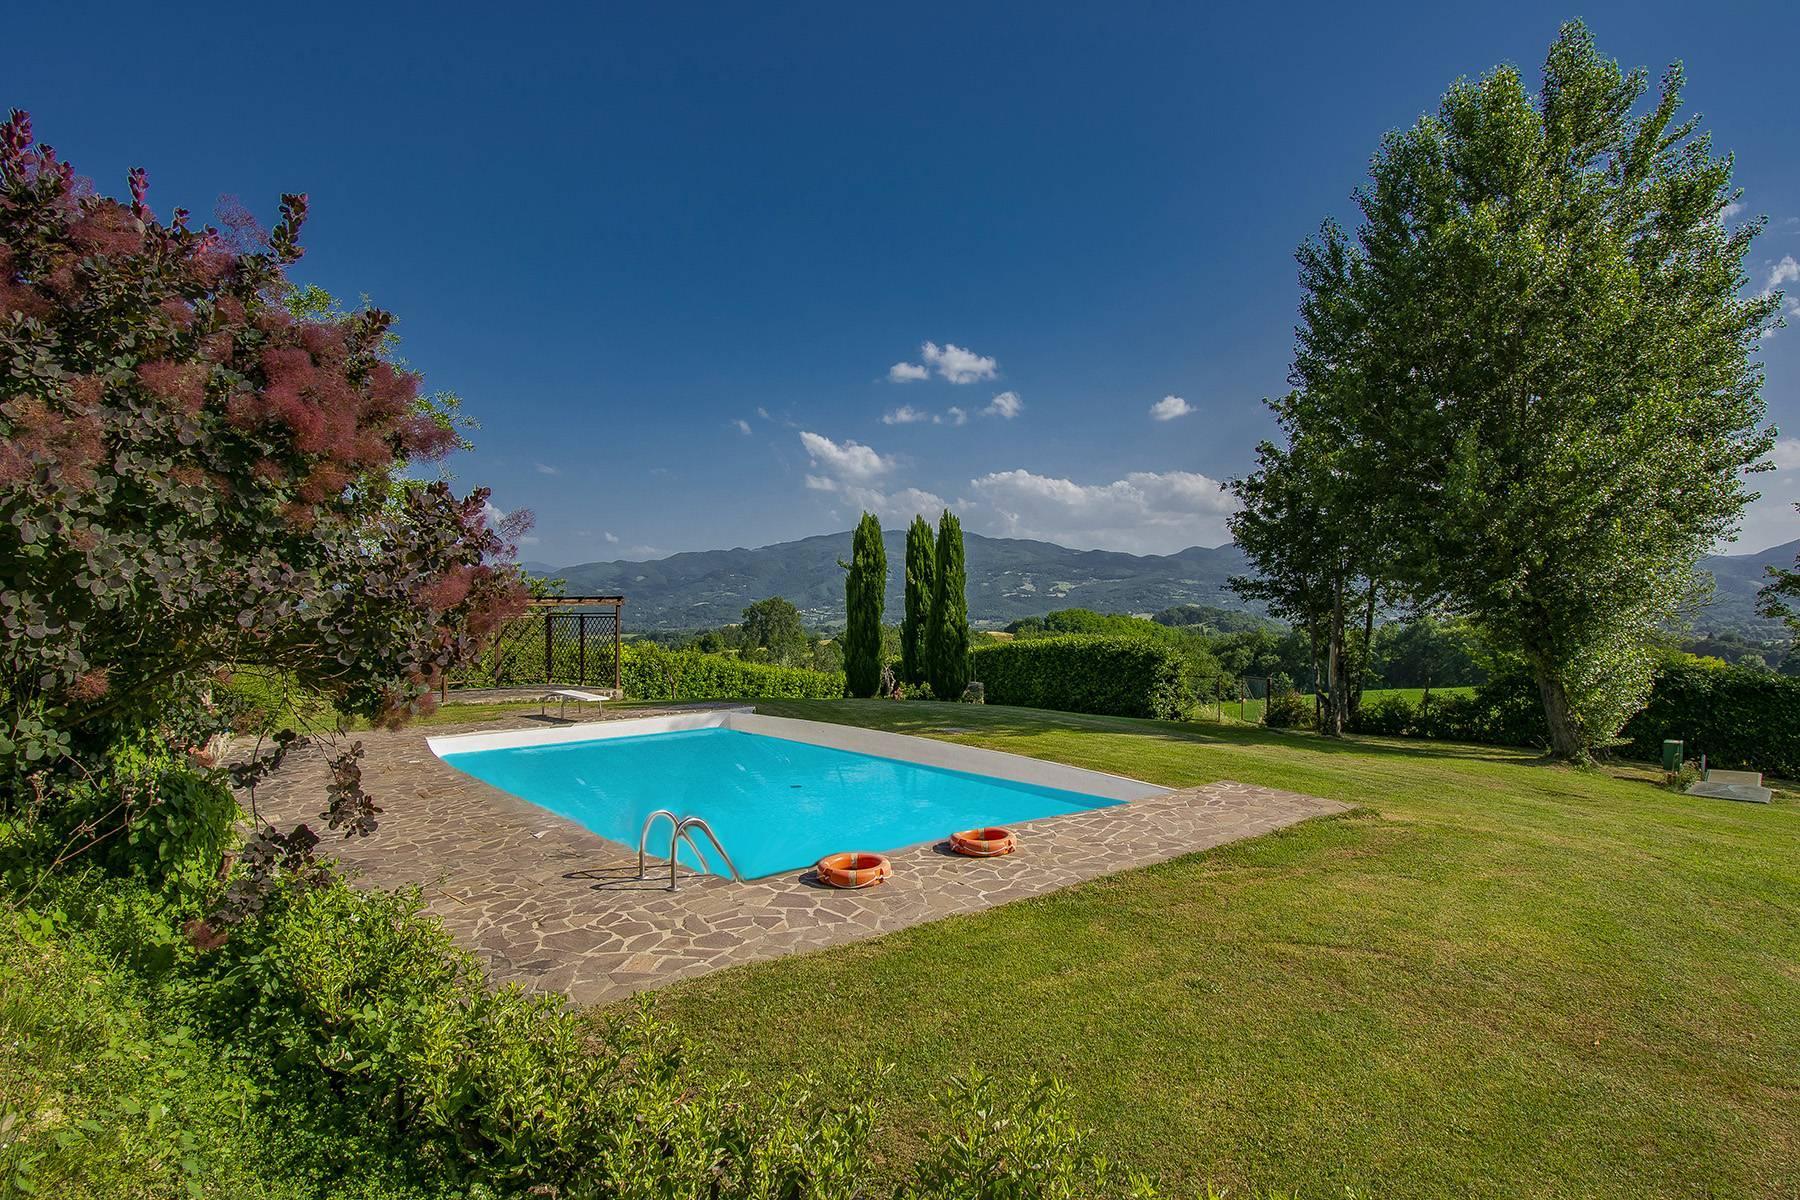 Farmhouse nestled on the Tuscan hills - 5